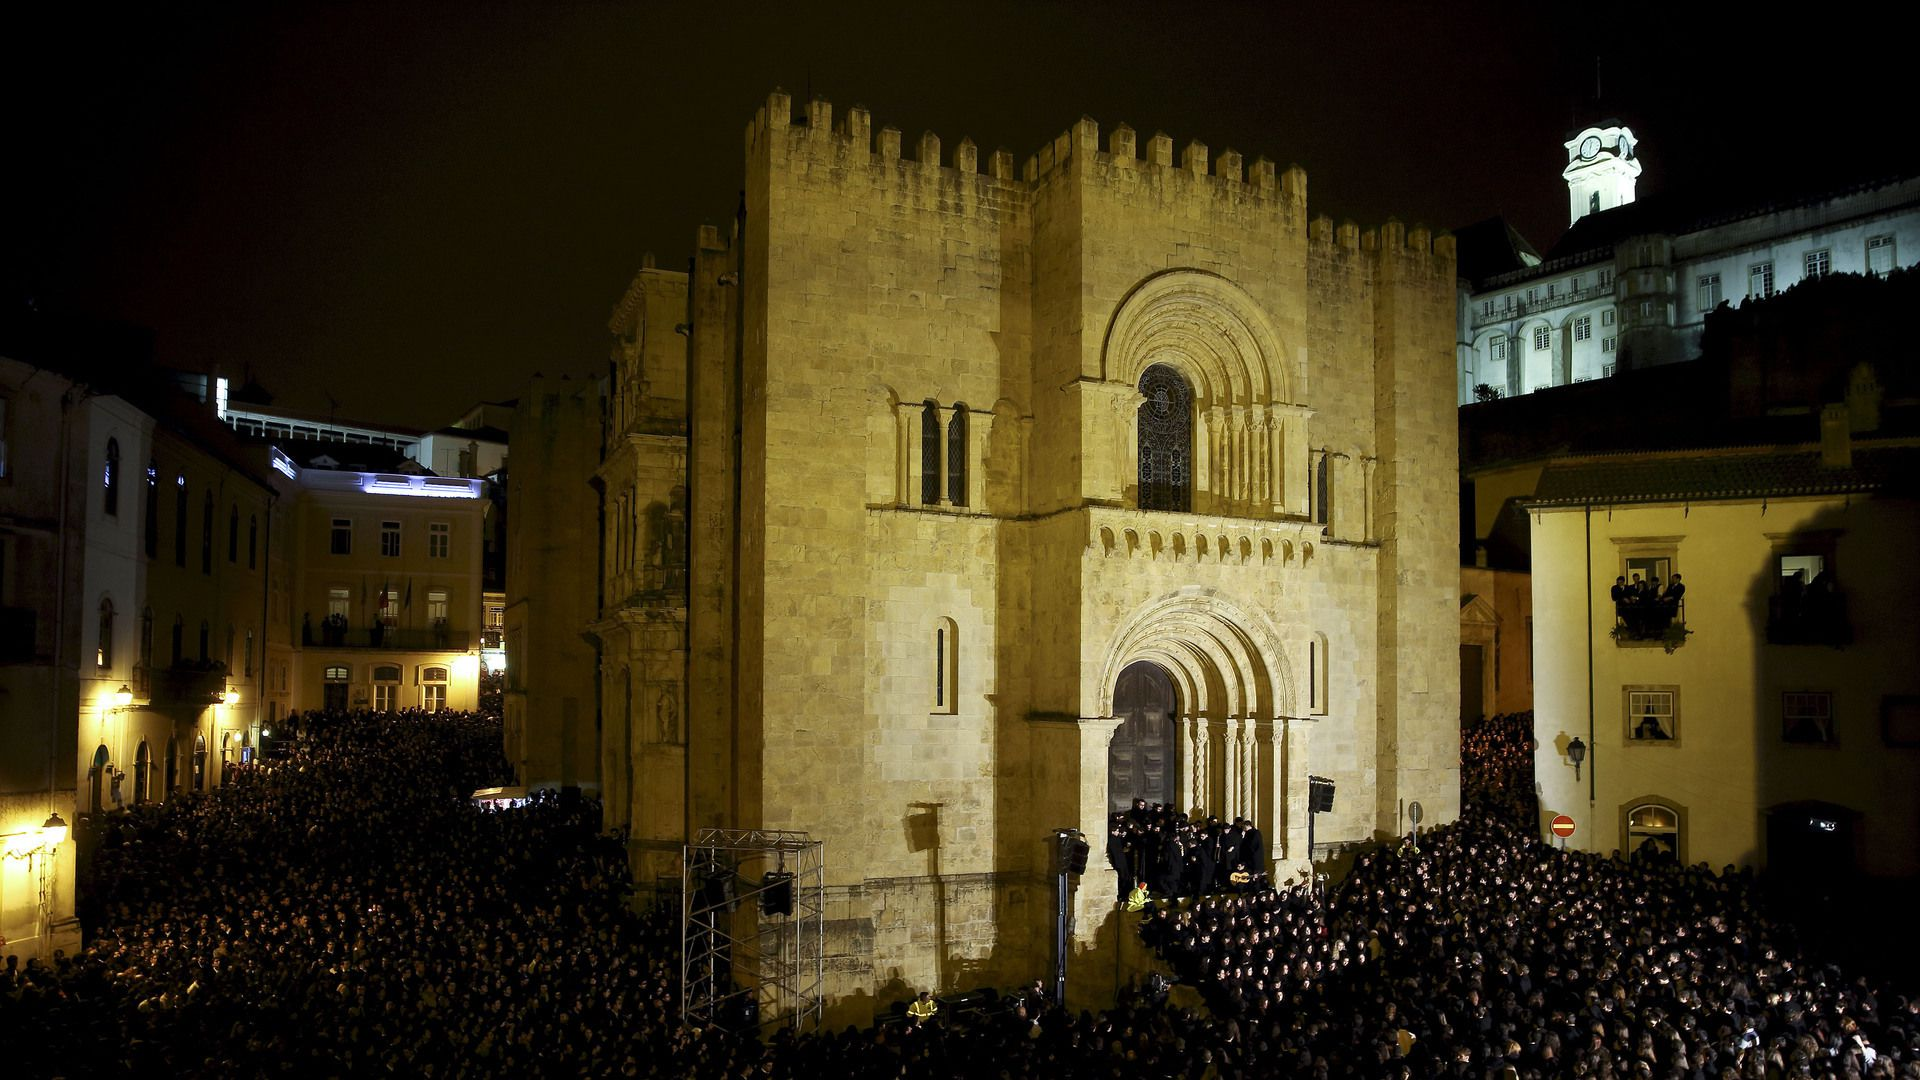 Serenata monumental da Queima das Fitas de Coimbra